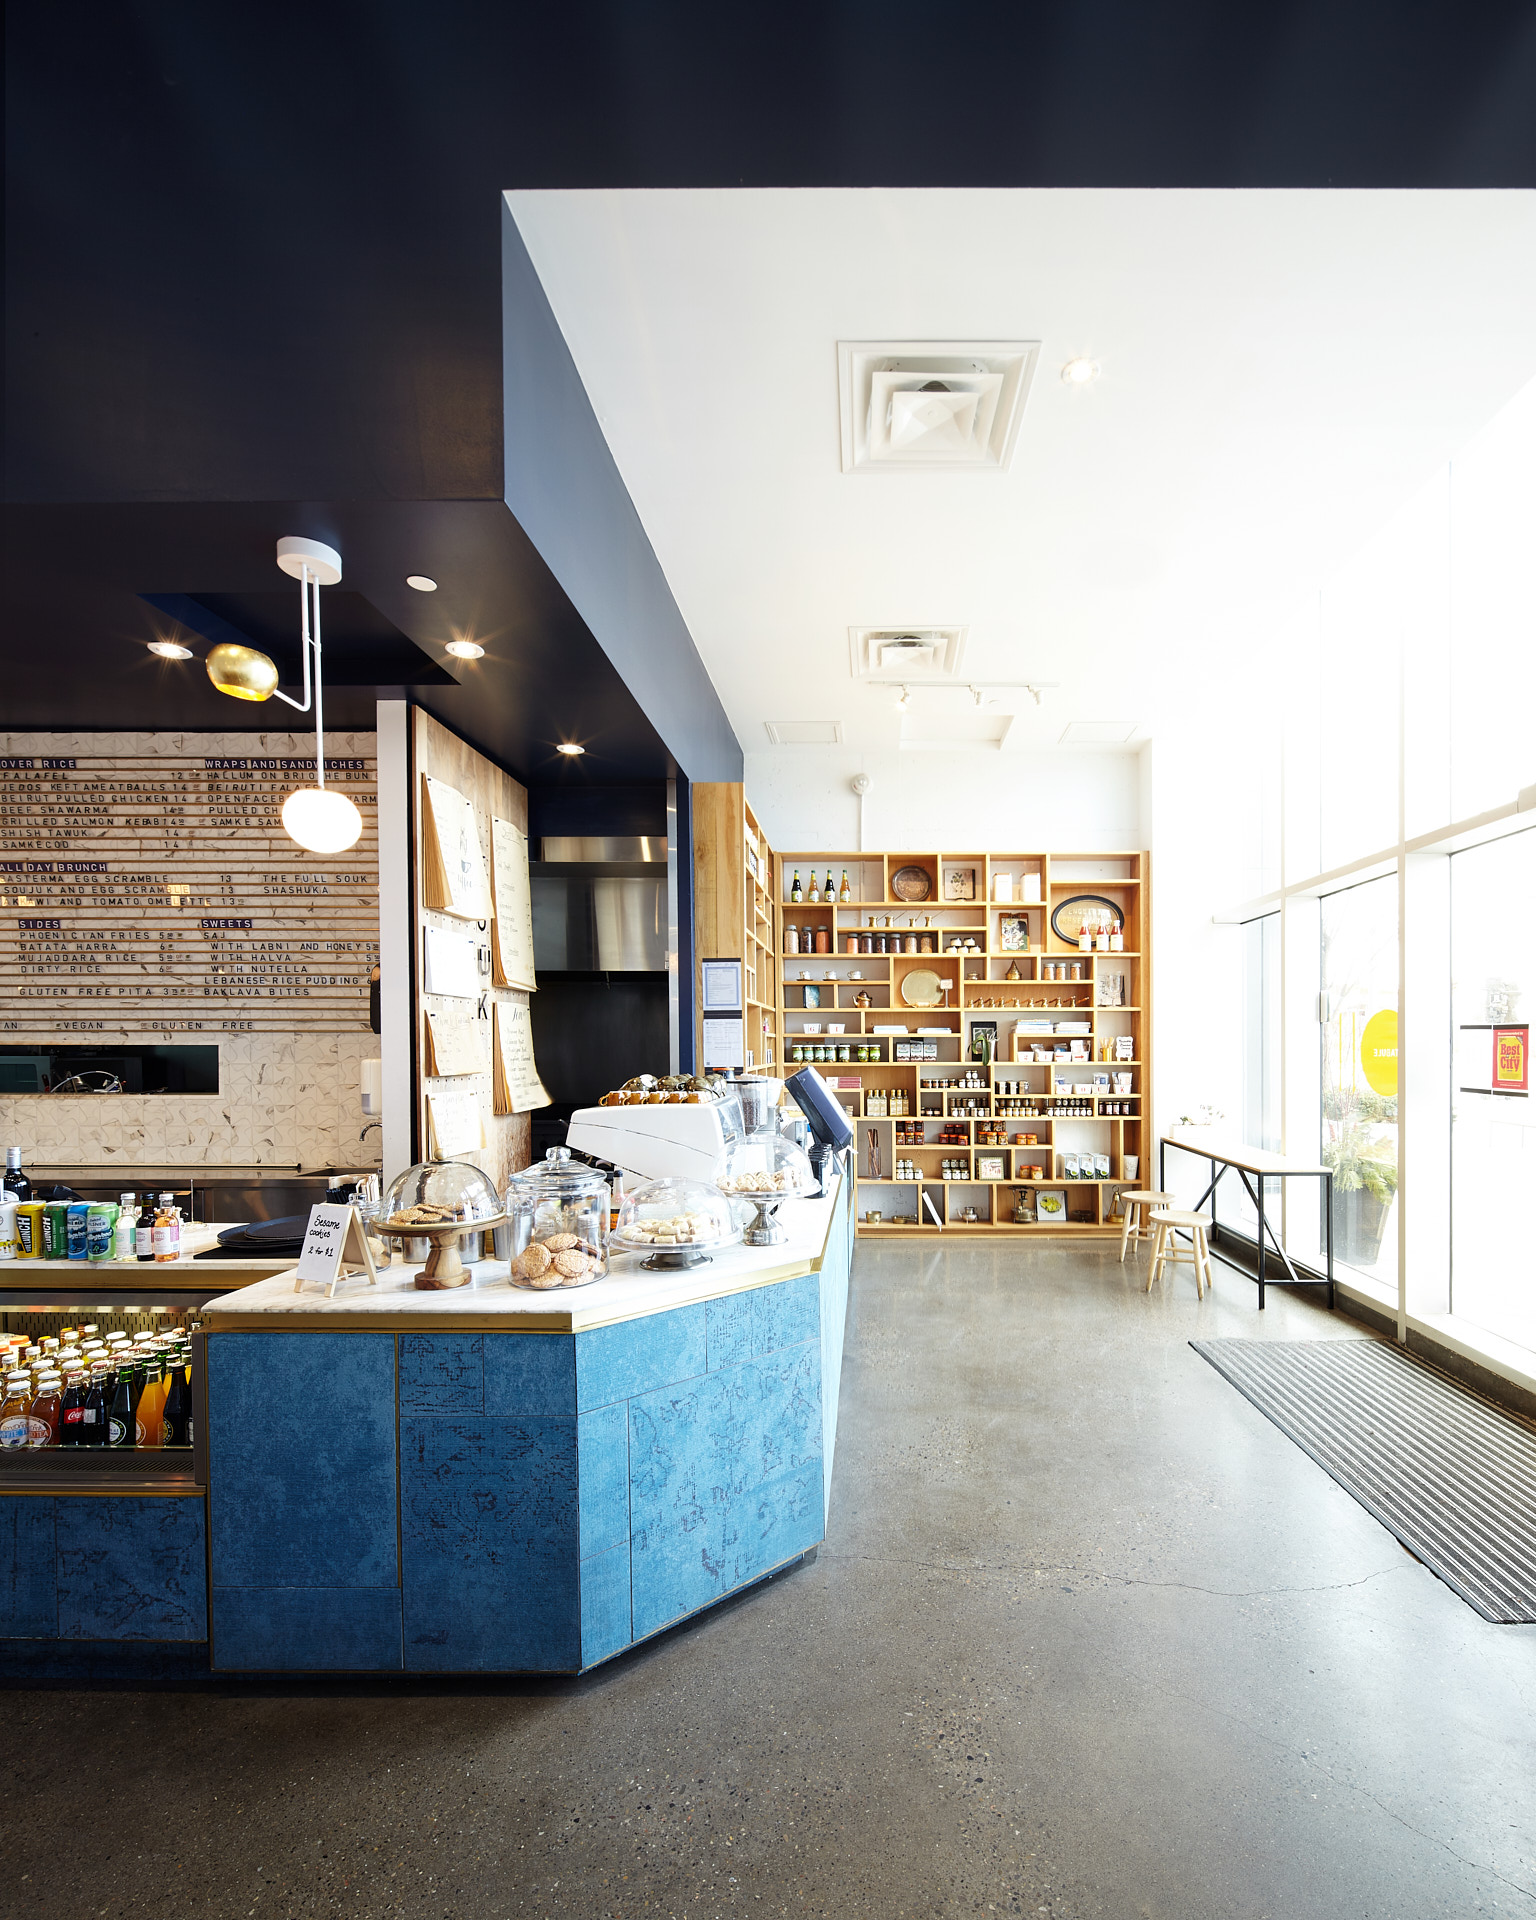 souk tabule restaurant interior photography